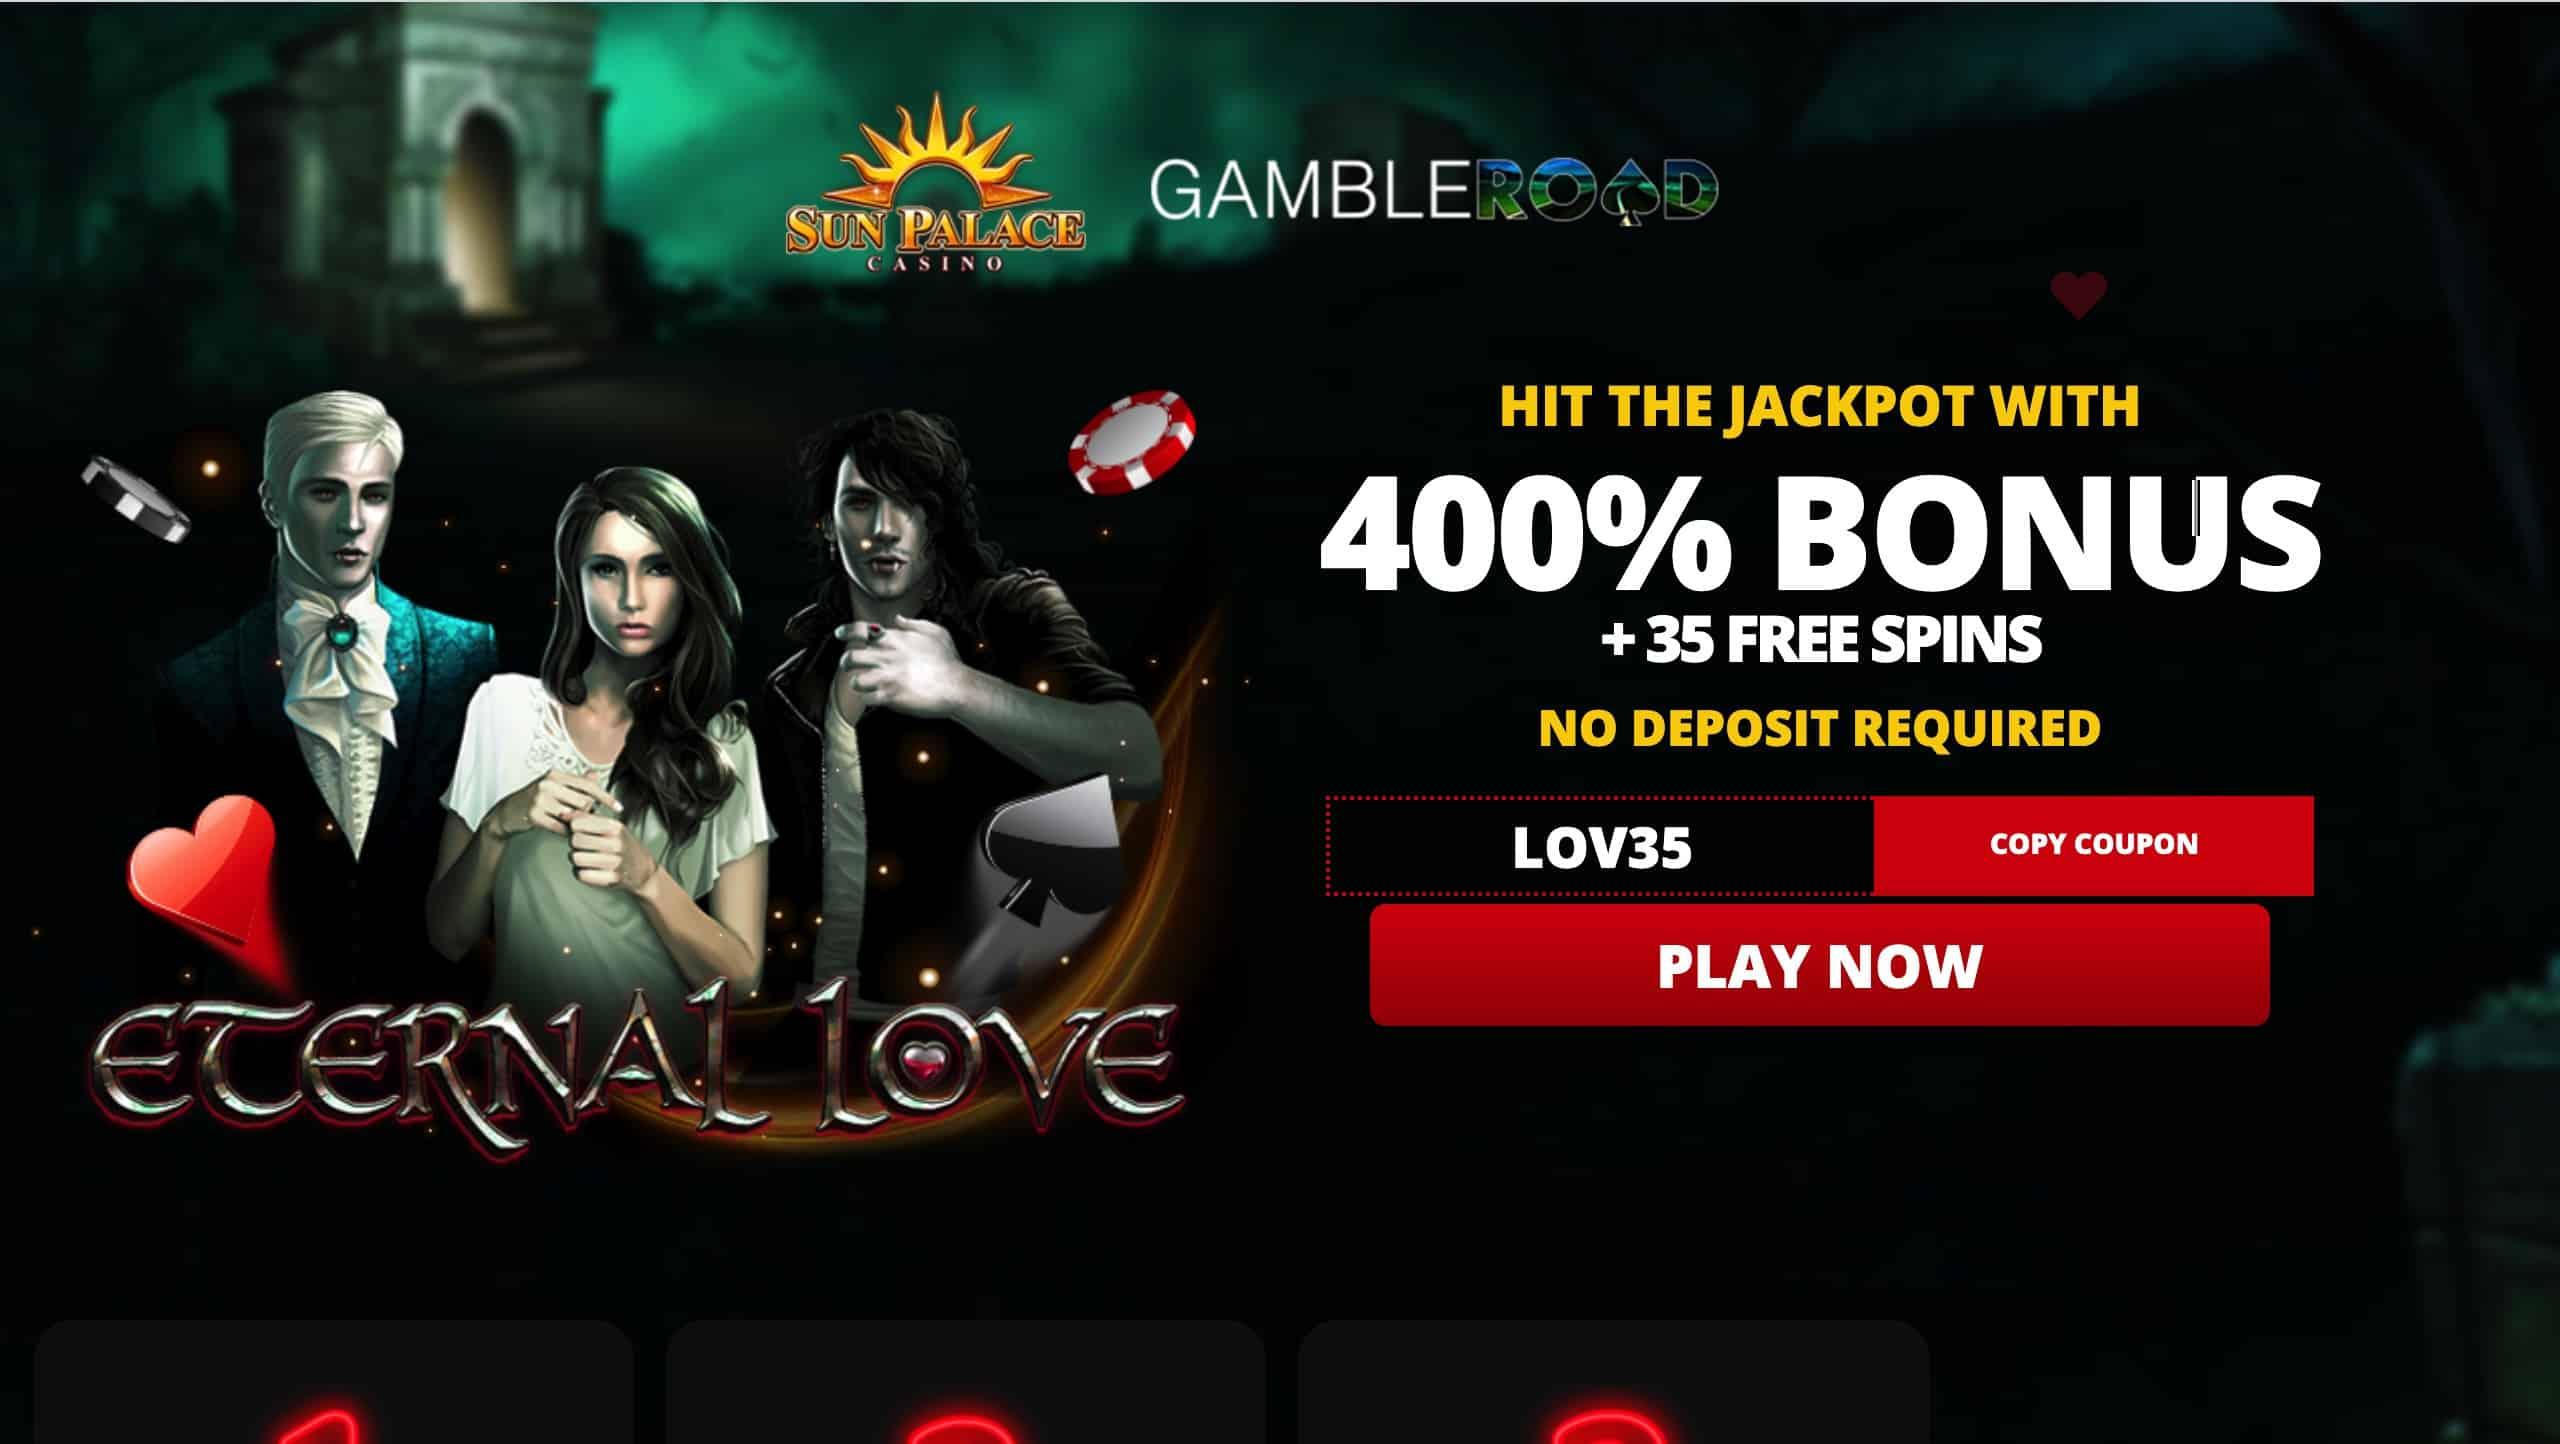 Sun Palace Casino 400 Deposit Bonus Plus 25 Free Spins